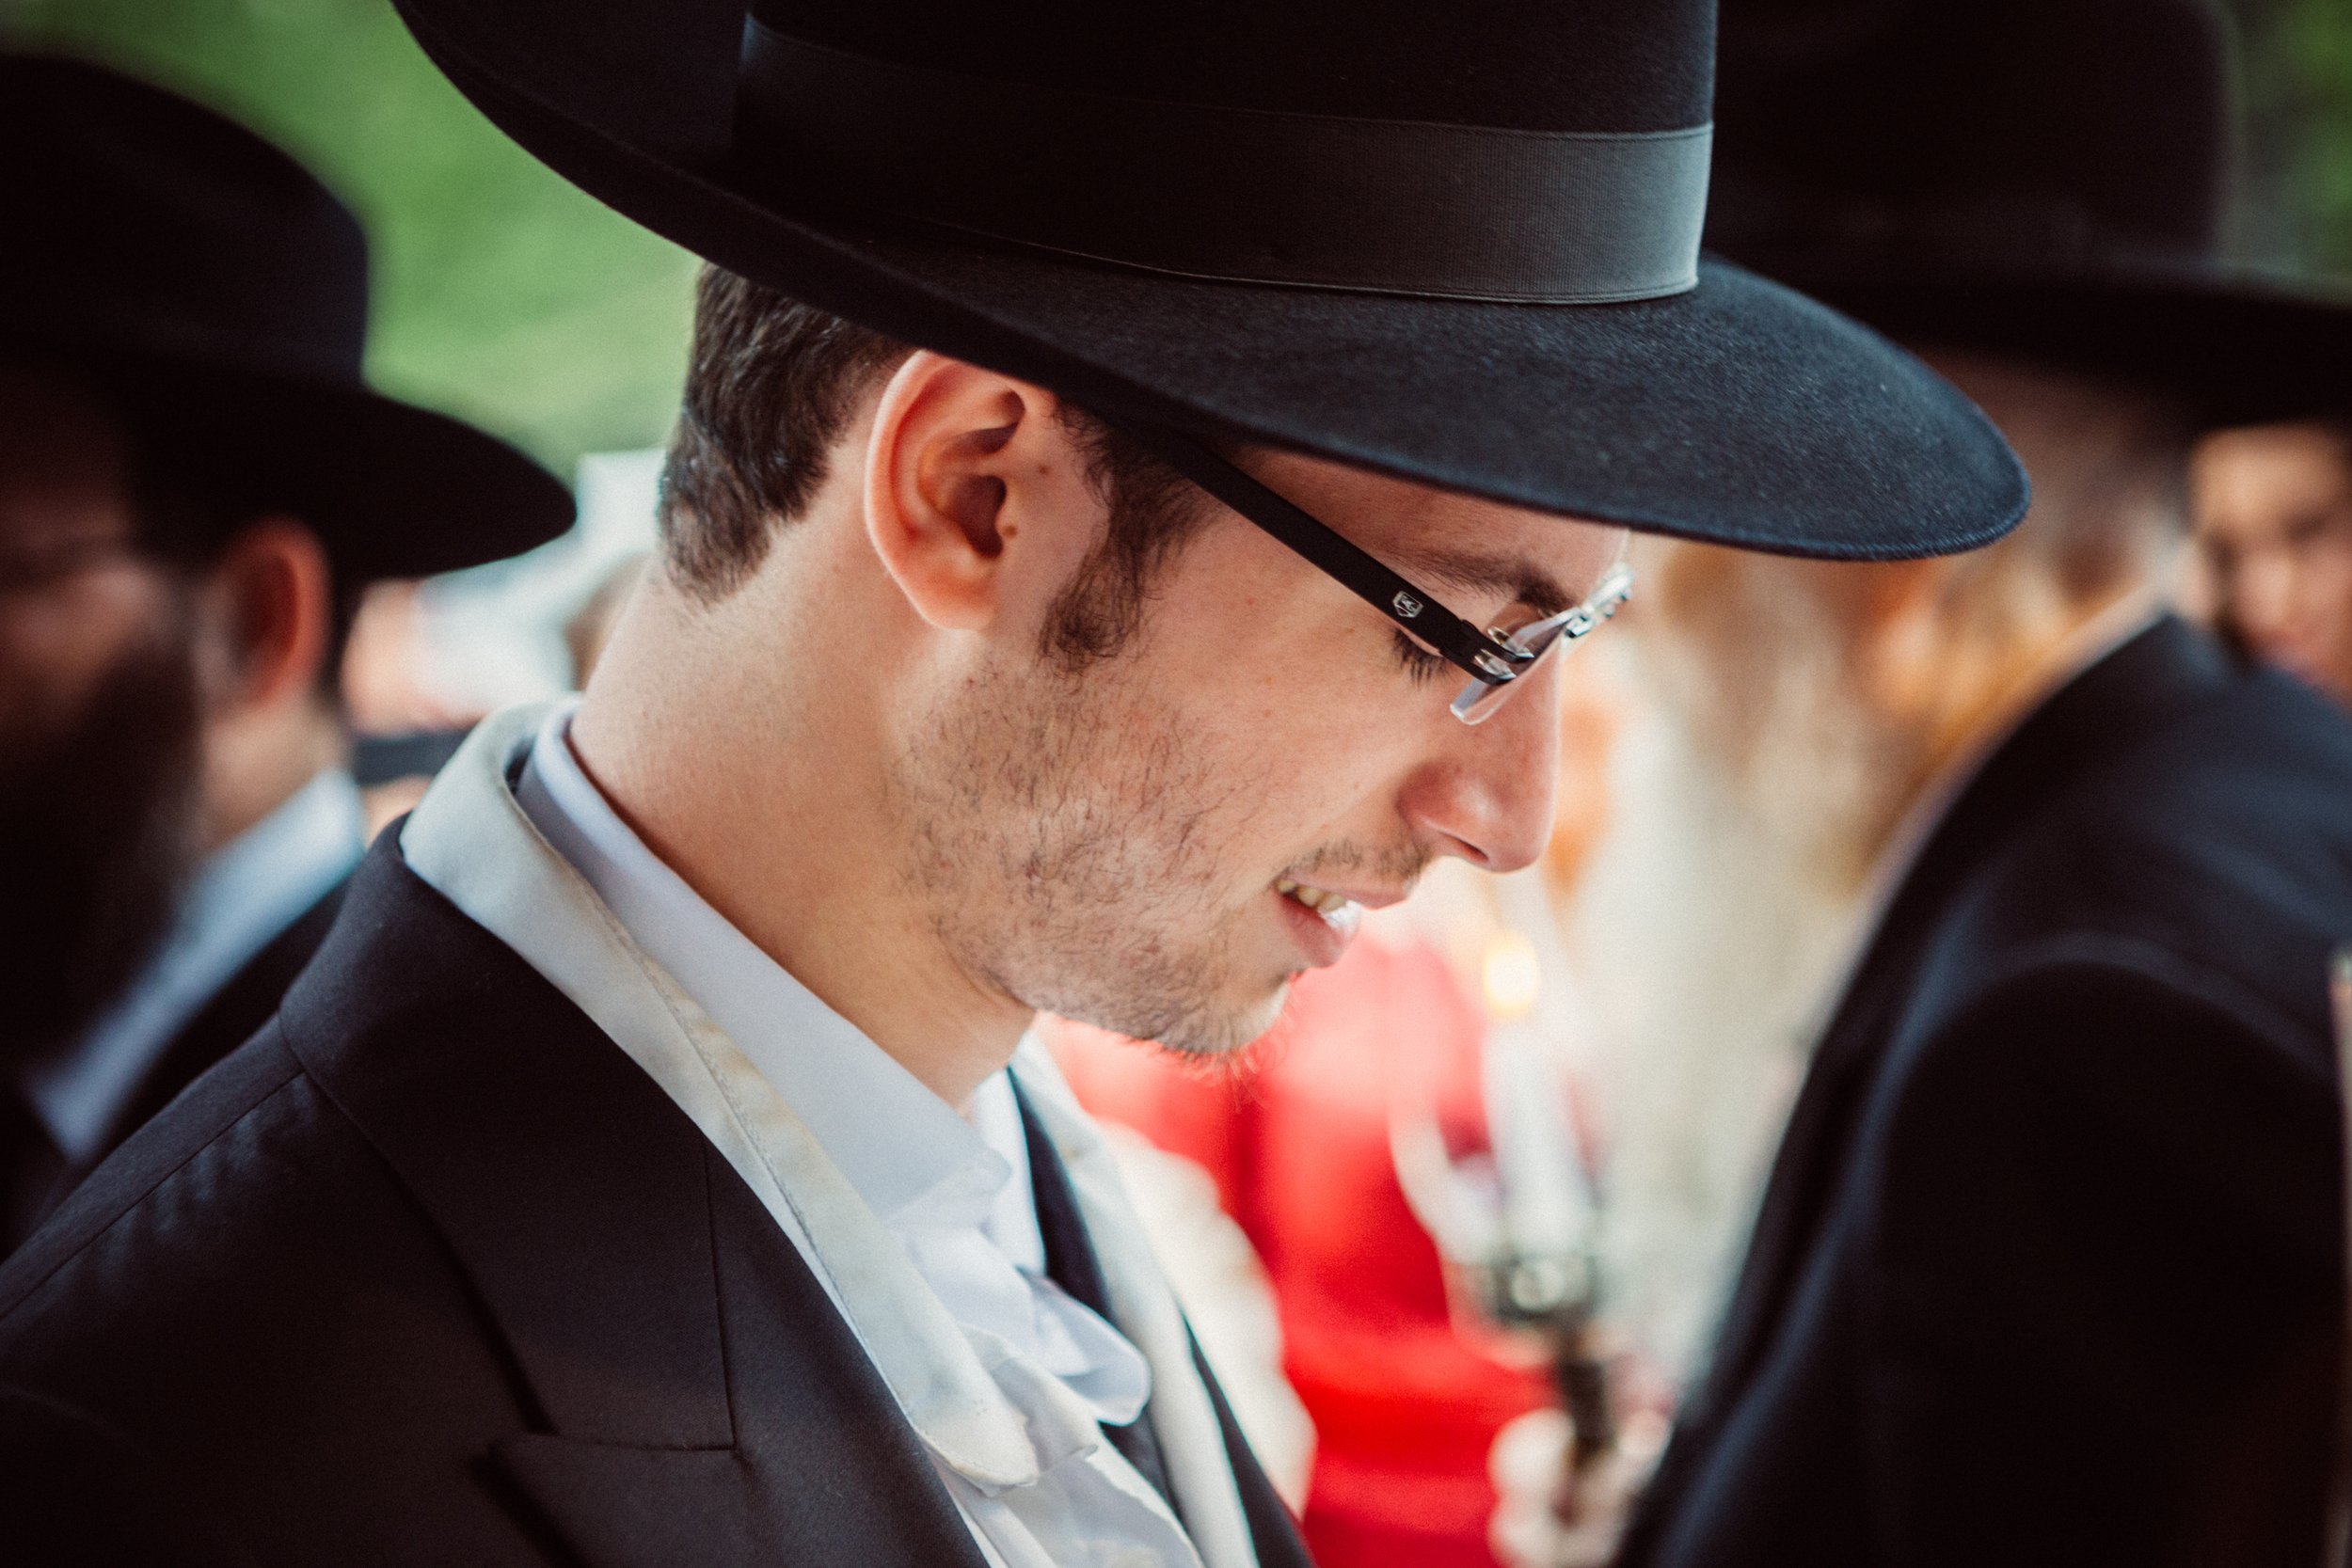 Wedding Iossi and Gitty Khafif  - Eliau Piha studio photography, new york, events, people 770 brooklyn -0425.jpg